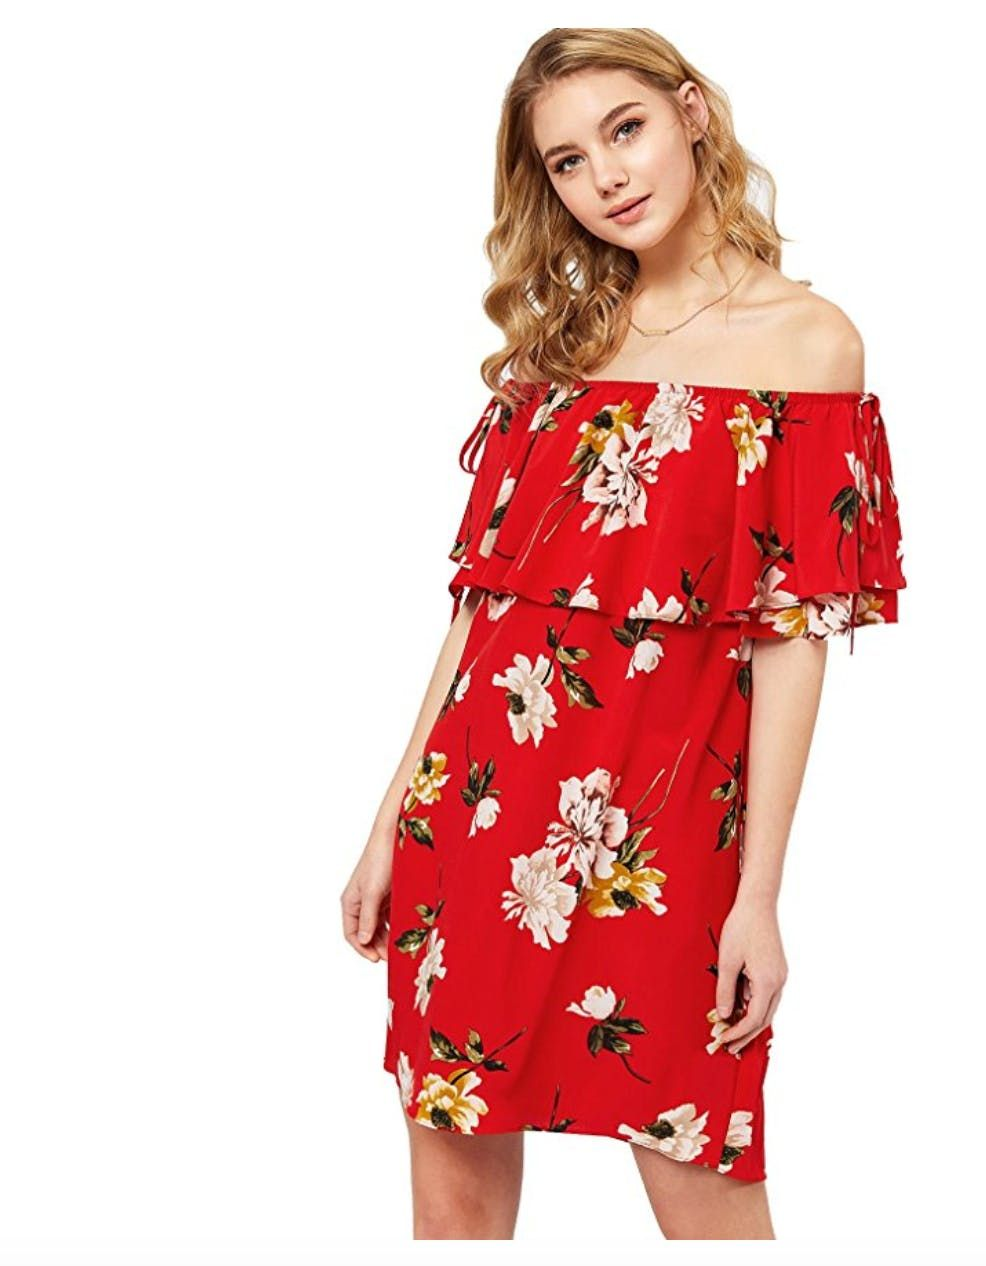 12 Affordable Spring Wedding Guest Dresses You Can Score On Amazon Spring Wedding Guest Dress Wedding Guest Dress Spring Wedding Guest [ 1266 x 986 Pixel ]